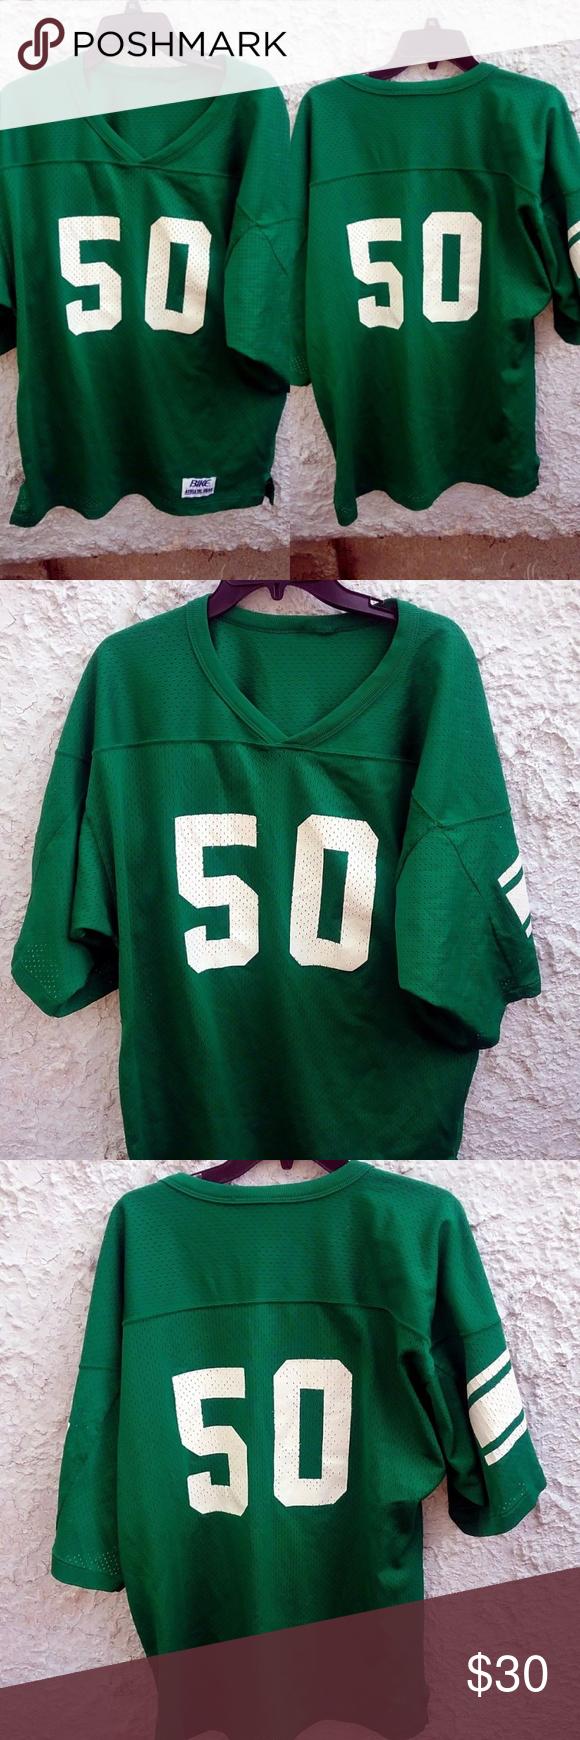 2605a9de7ab Vintage 80s BIKE Football Jersey #50 Eagles Jets L Vintage 80s Bike football  jersey. Can be used for the Philadelphia Eagles or New York Jets. Green  color ...